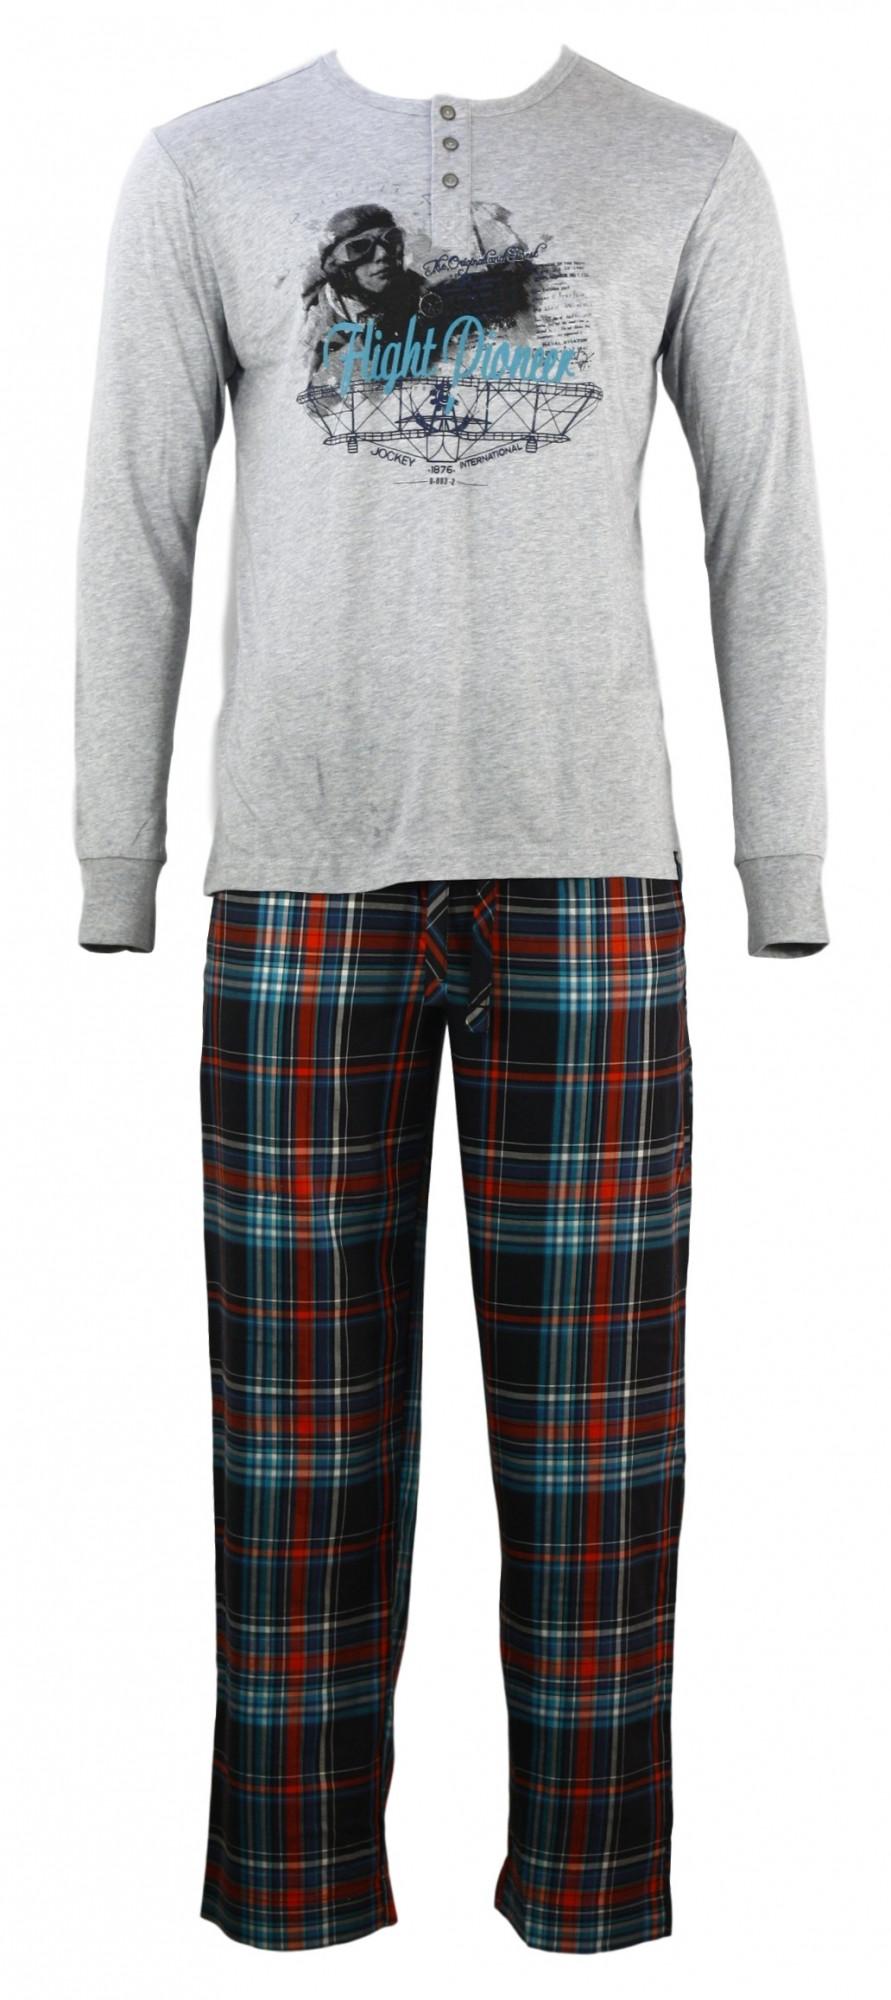 Pánské pyžamo 52227 - Jockey Barva: kostka, Velikost: L